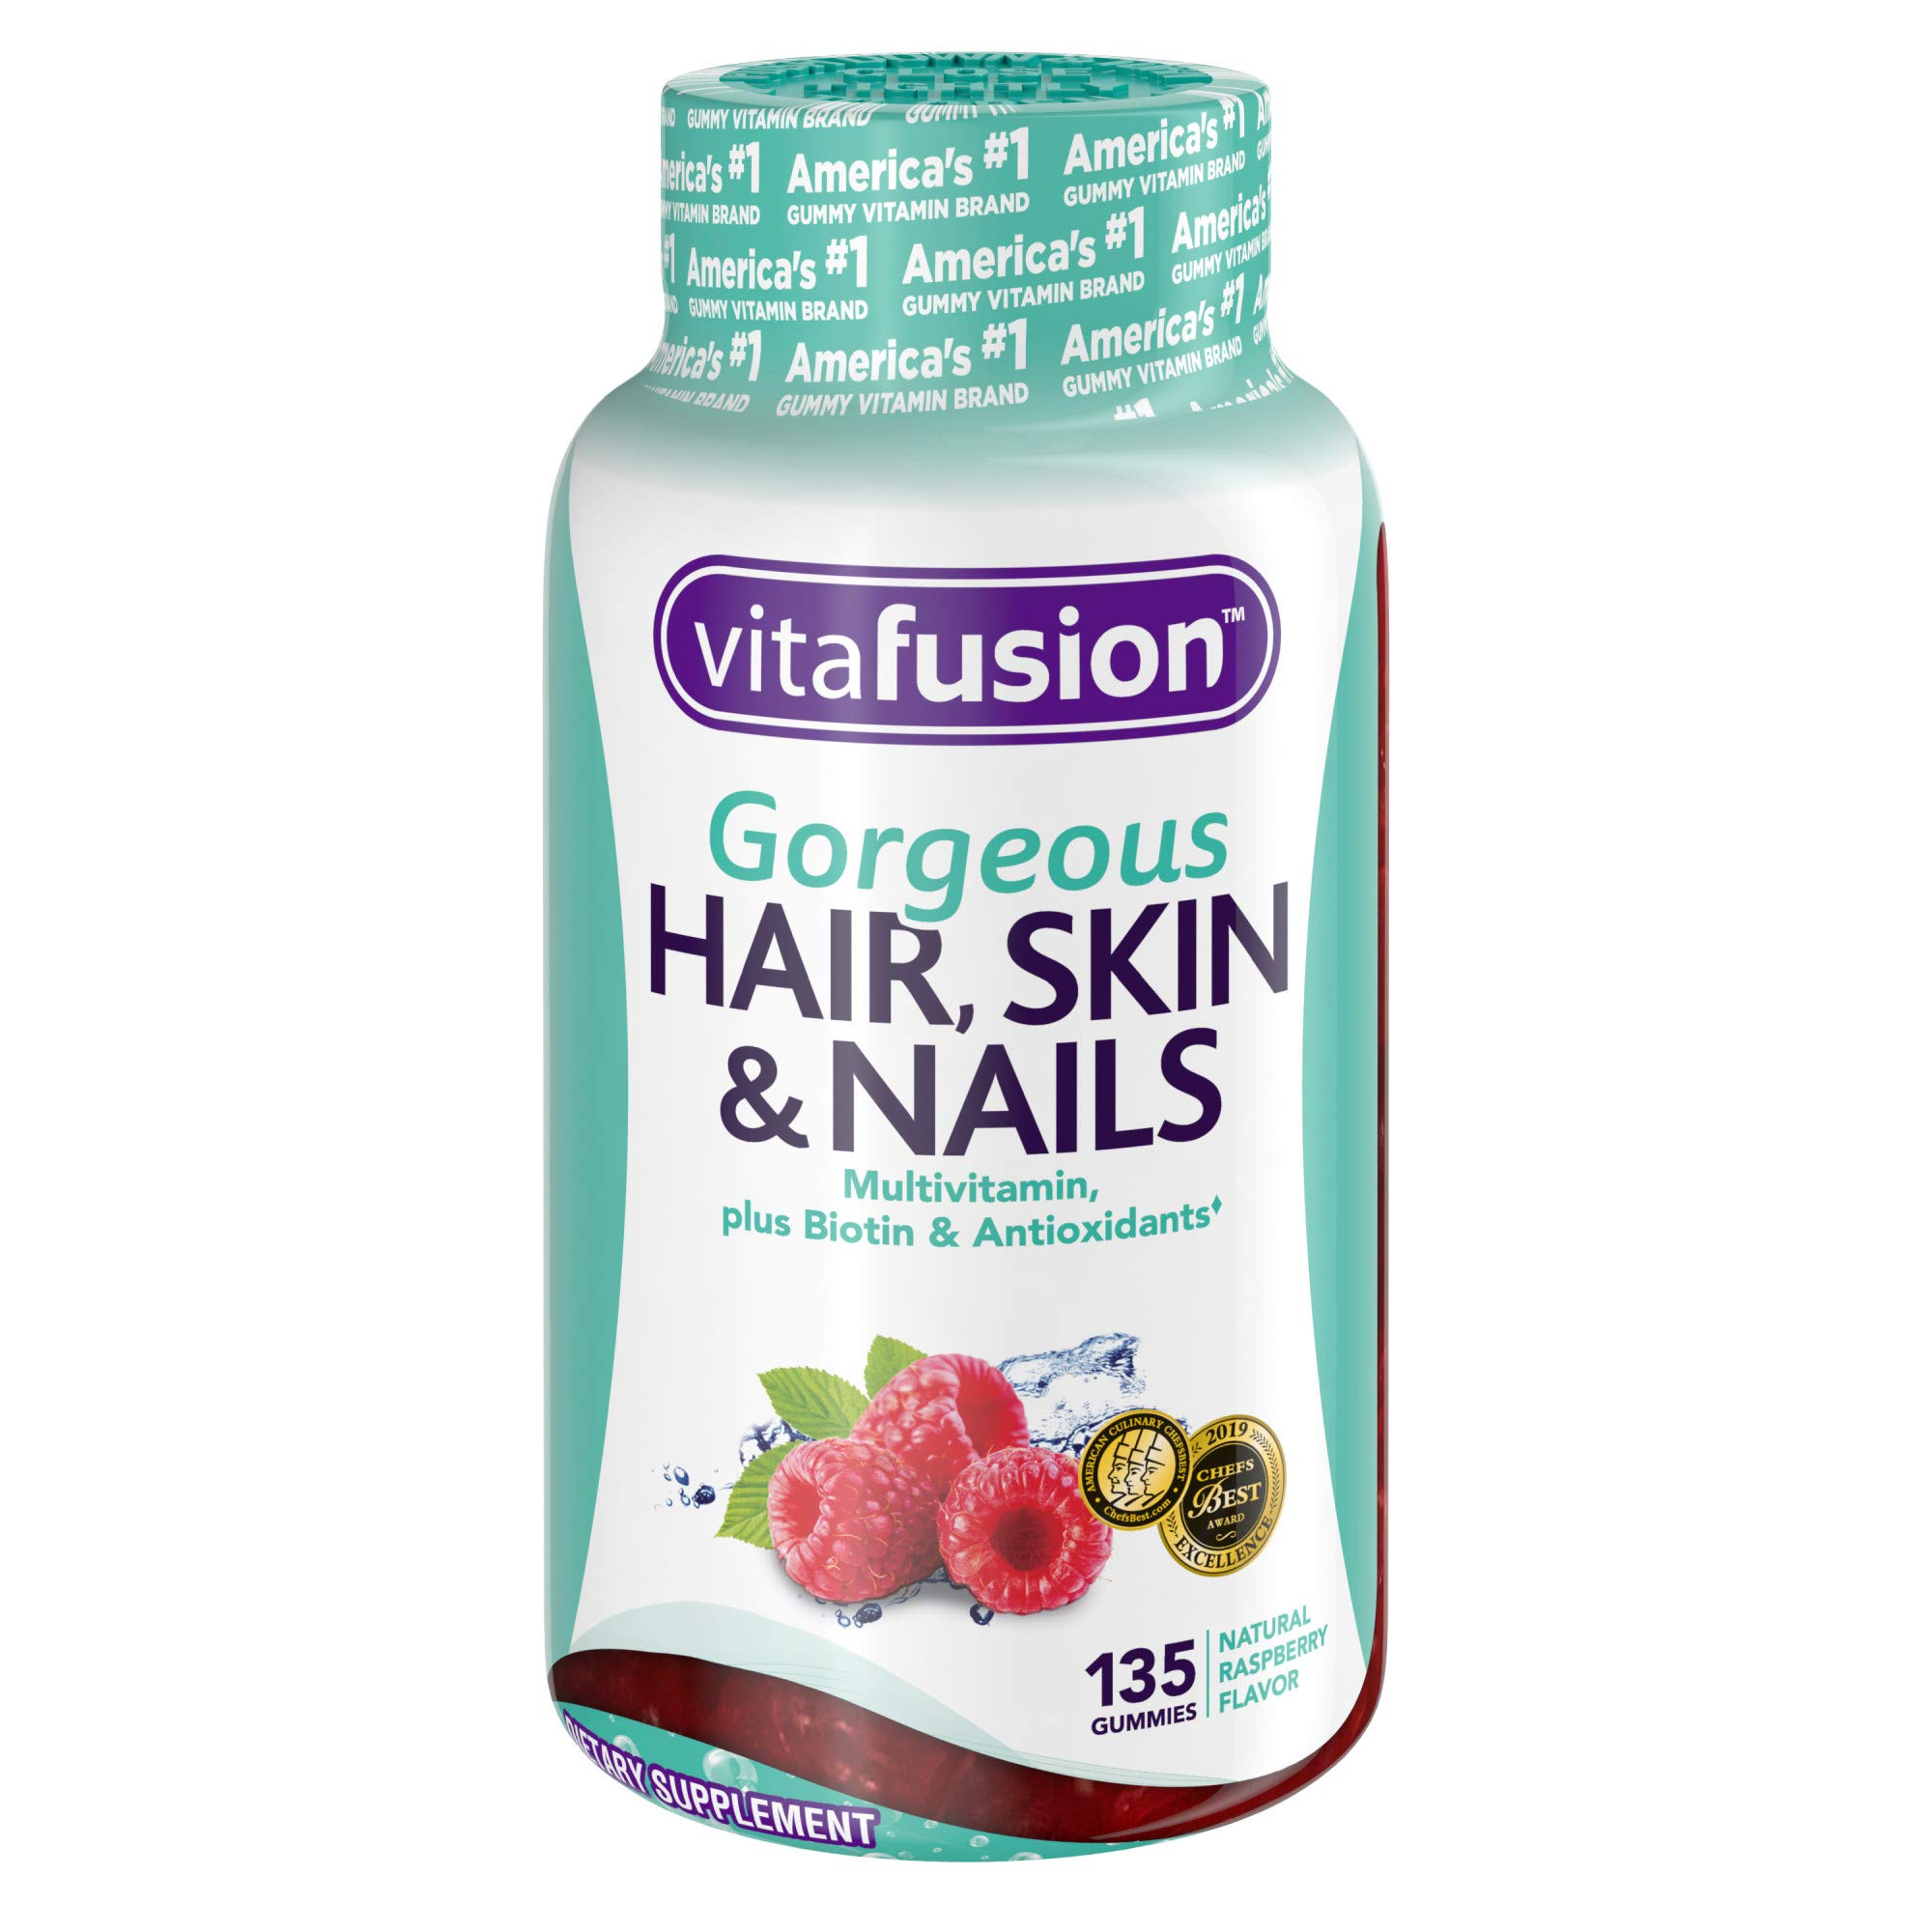 Vitafusion Gorgeous Hair, Skin & Nails Multivitamin Gummy Vitamins ...